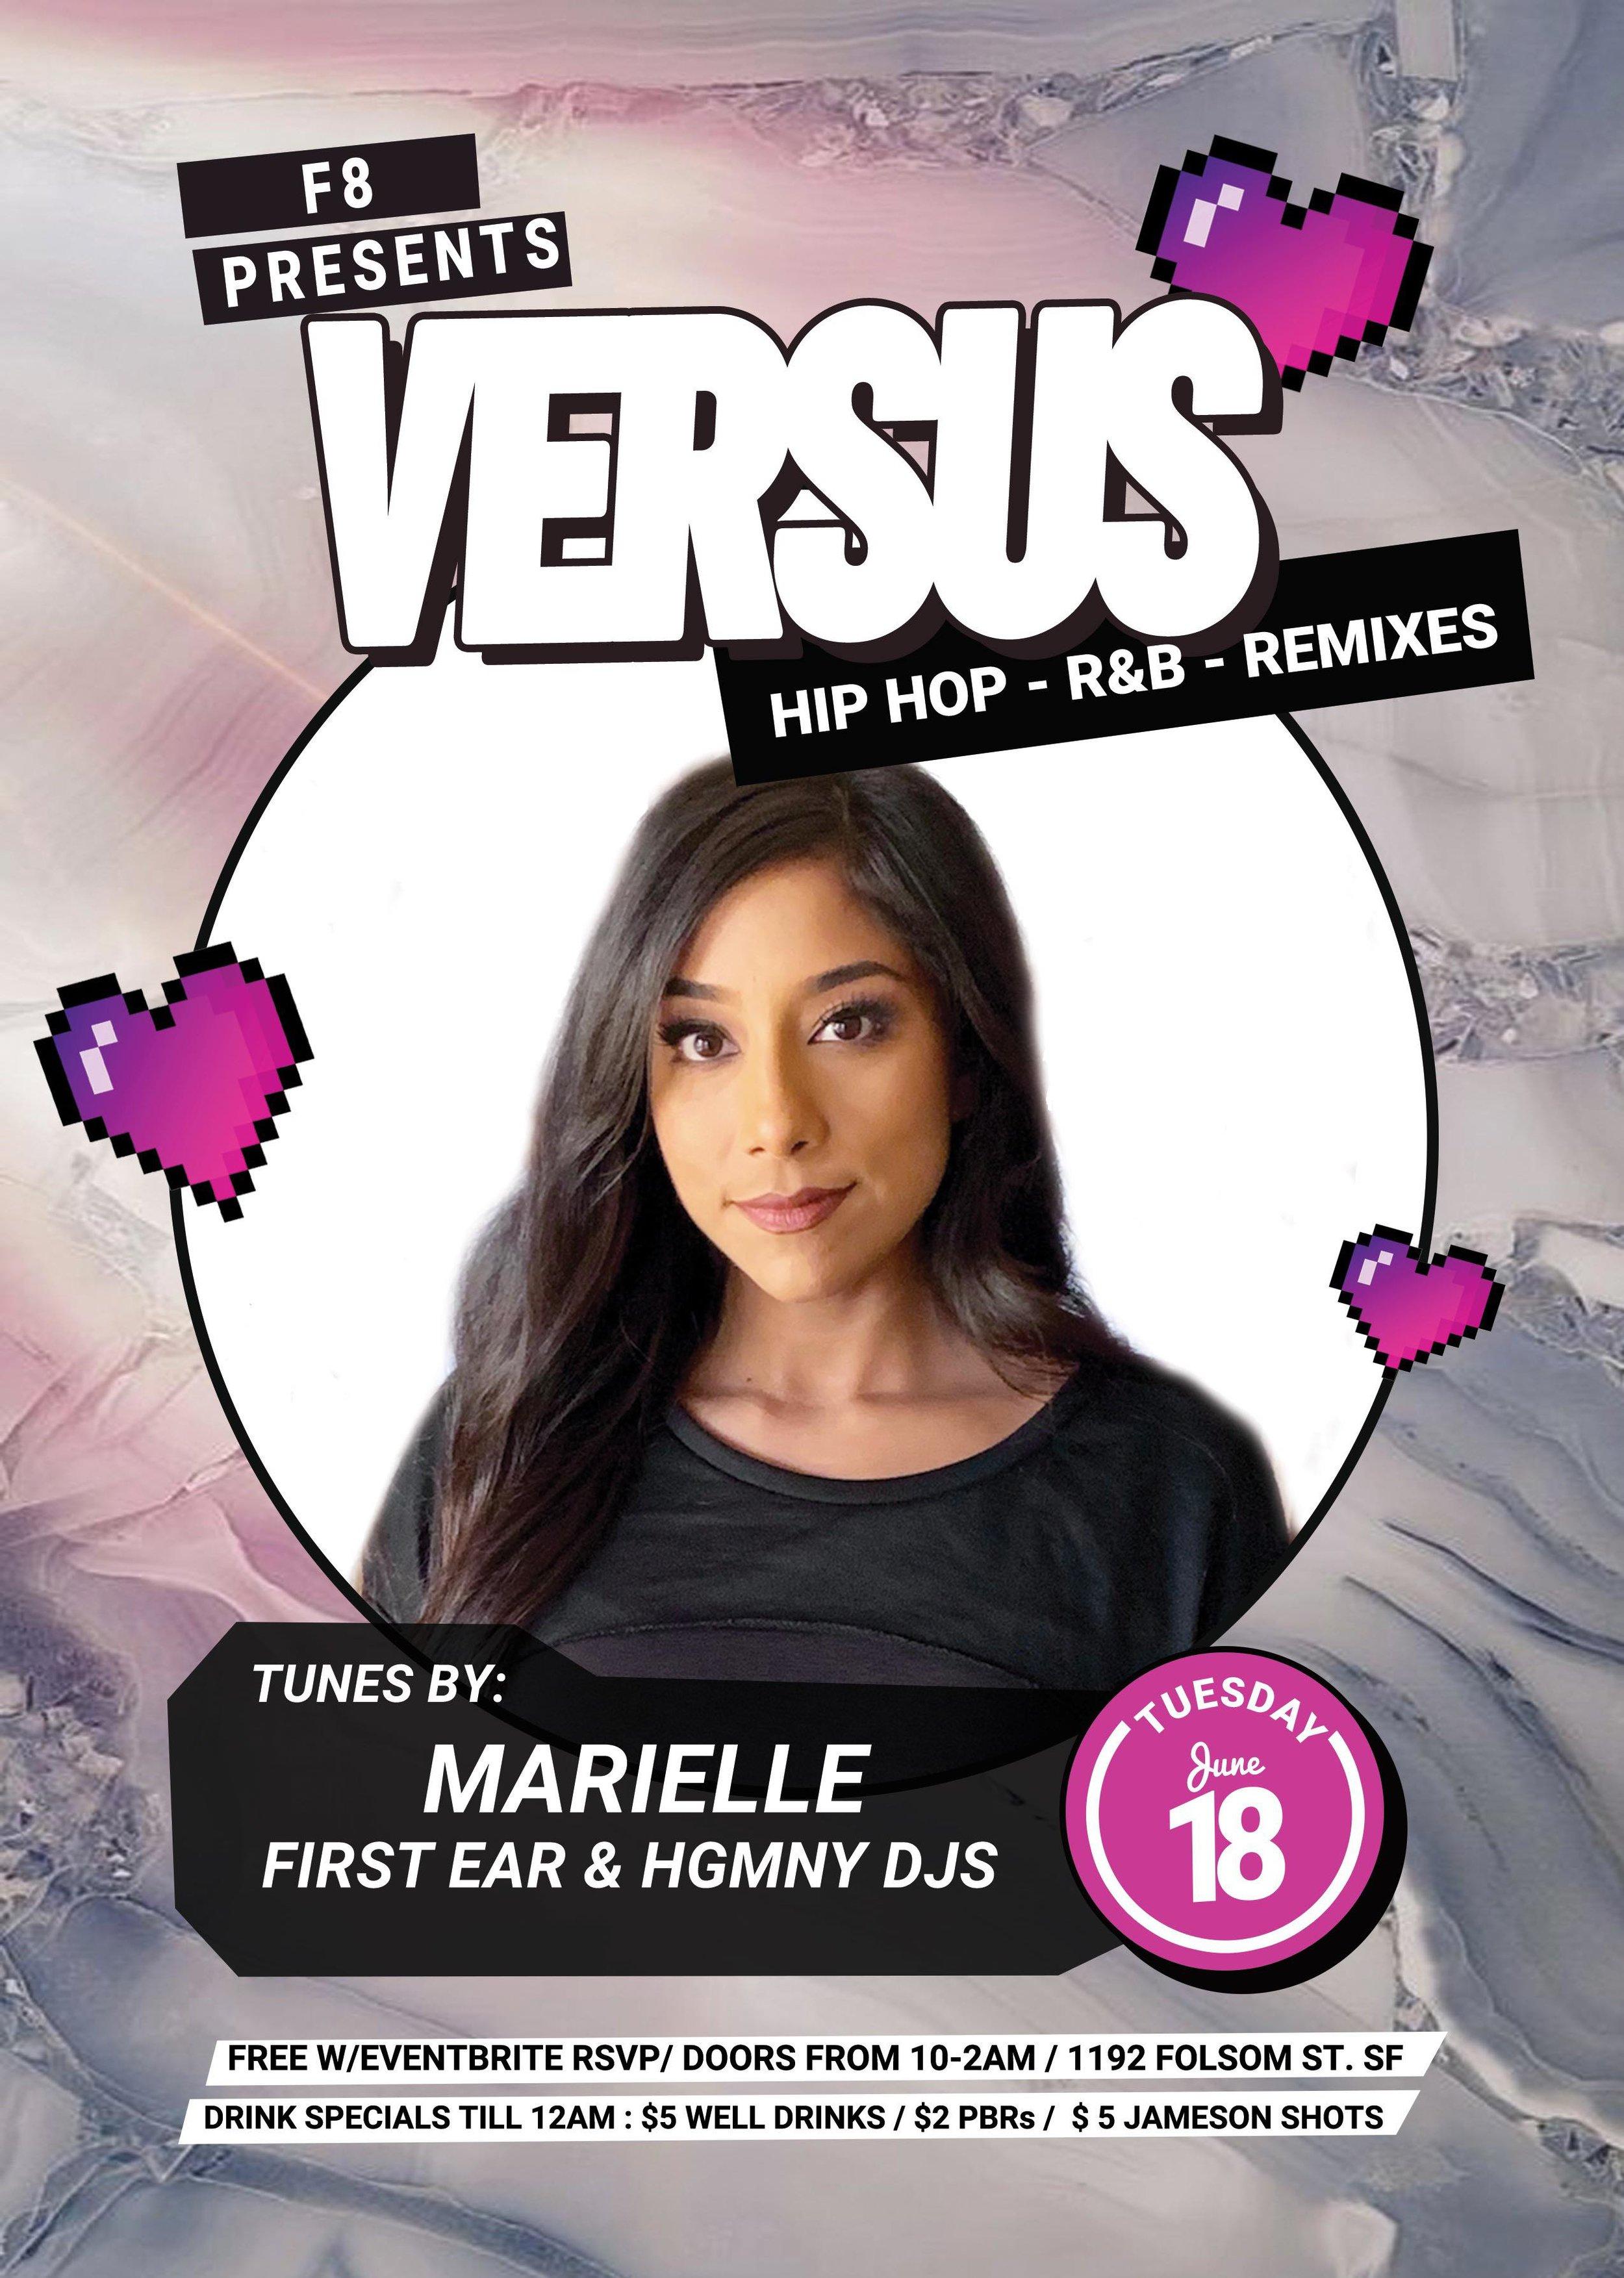 Versus Tuesdays — F8 - San Francisco Nightclub